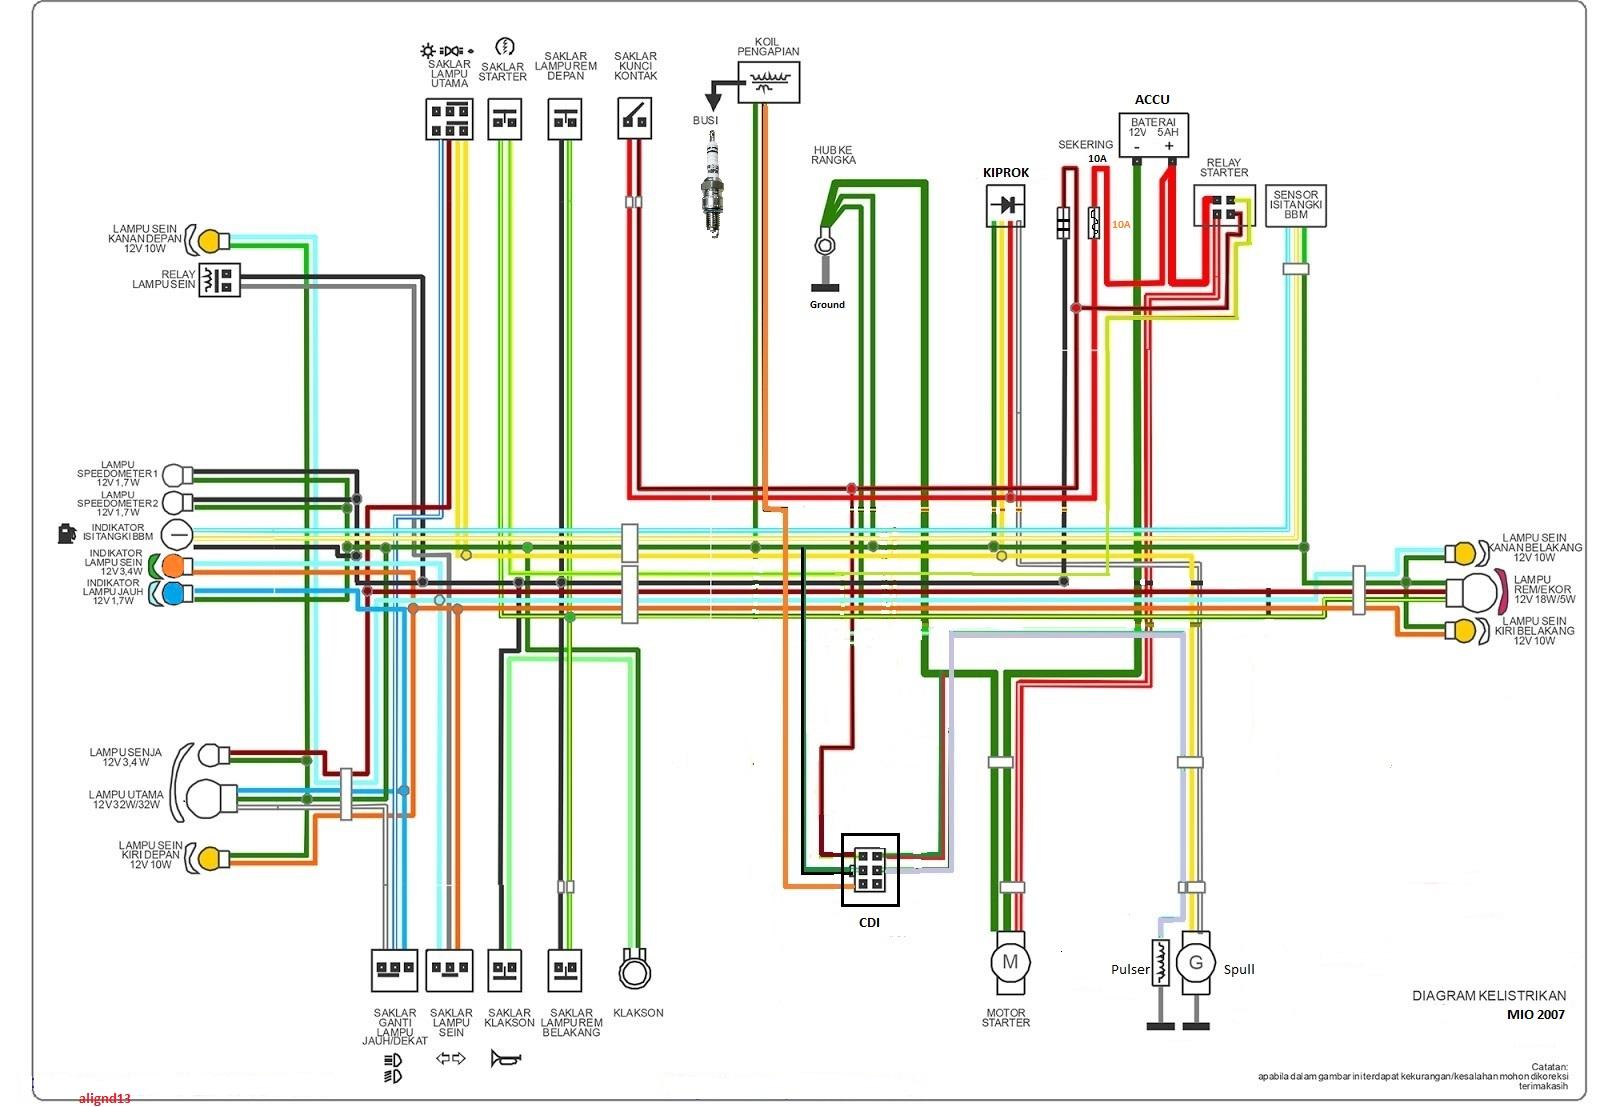 hight resolution of diagram kelistrikan mio